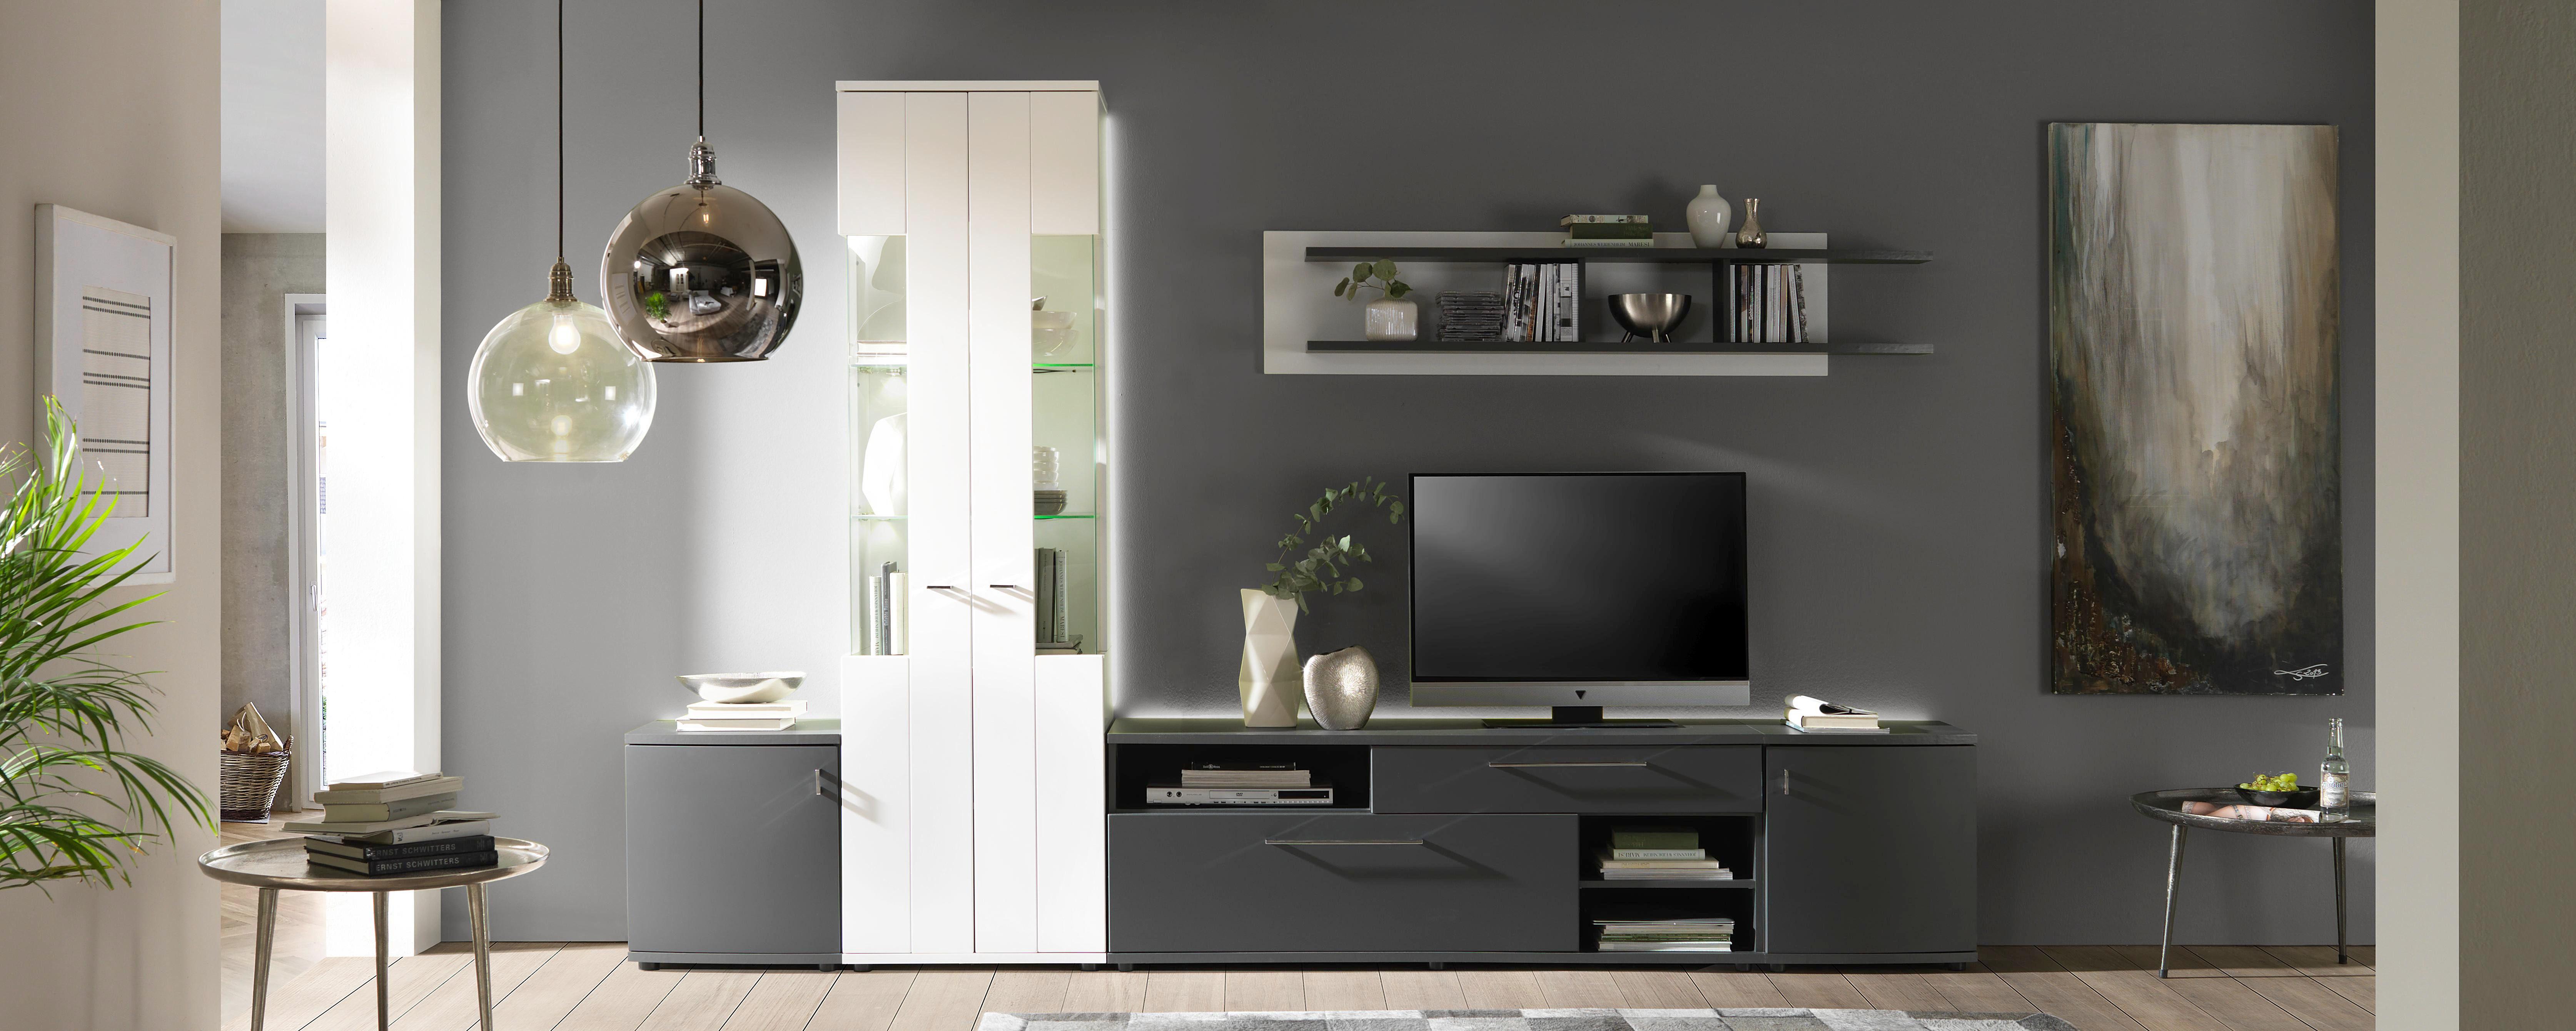 REGAL ZA DNEVNI BORAVAK - Grafitno siva/Crna, Moderno, Plastika/Metal (310/205/42cm) - Carryhome